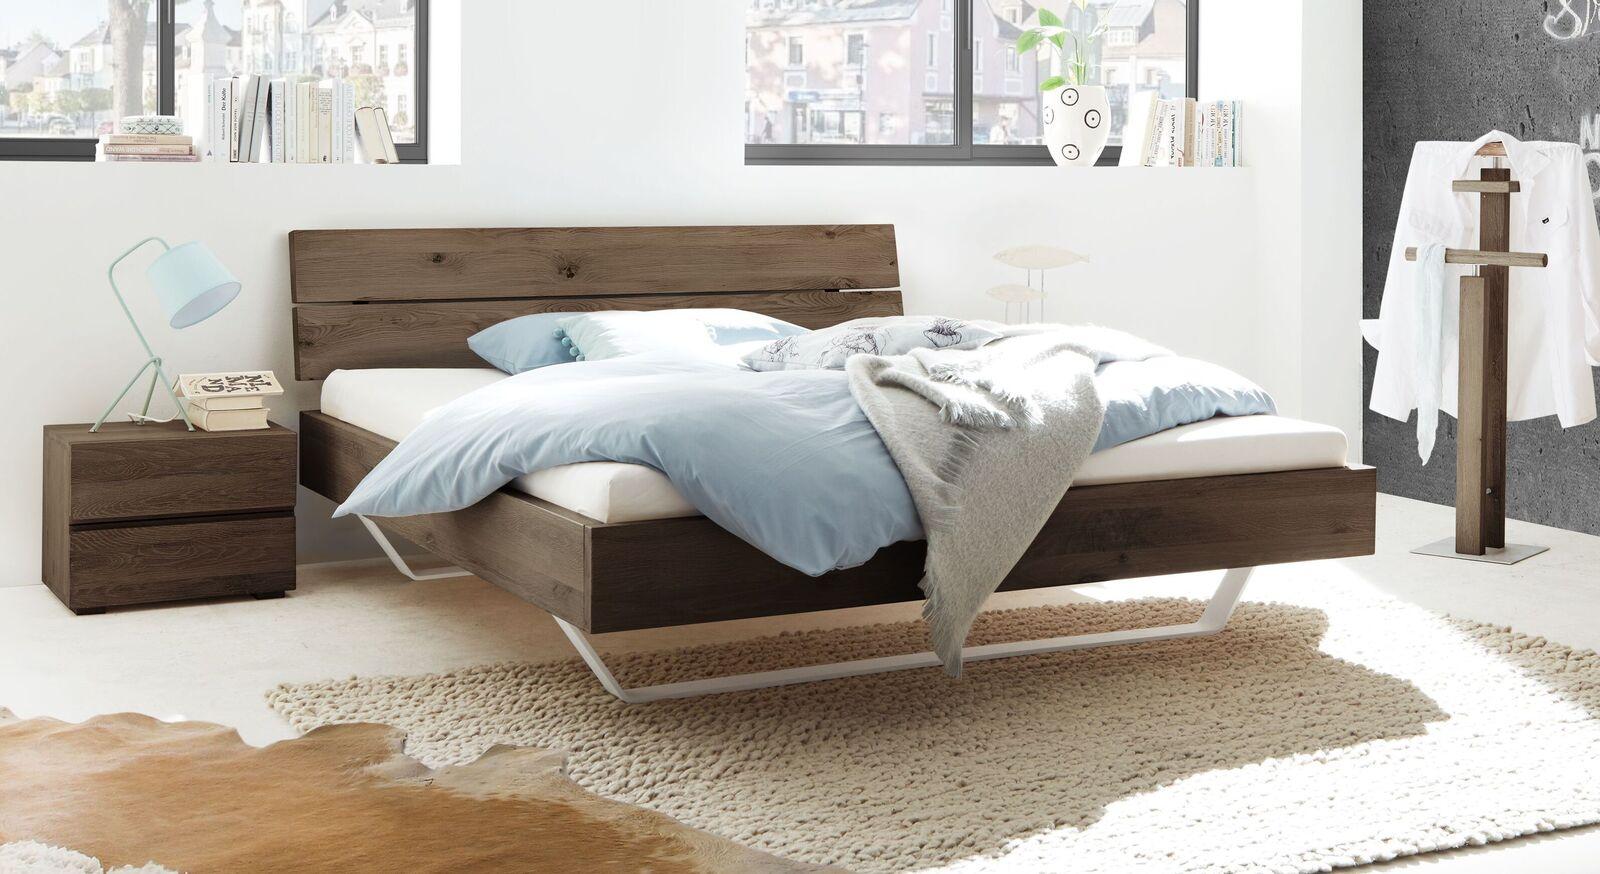 Trendiges Bett Nakiri mit massivem Bettrahmen